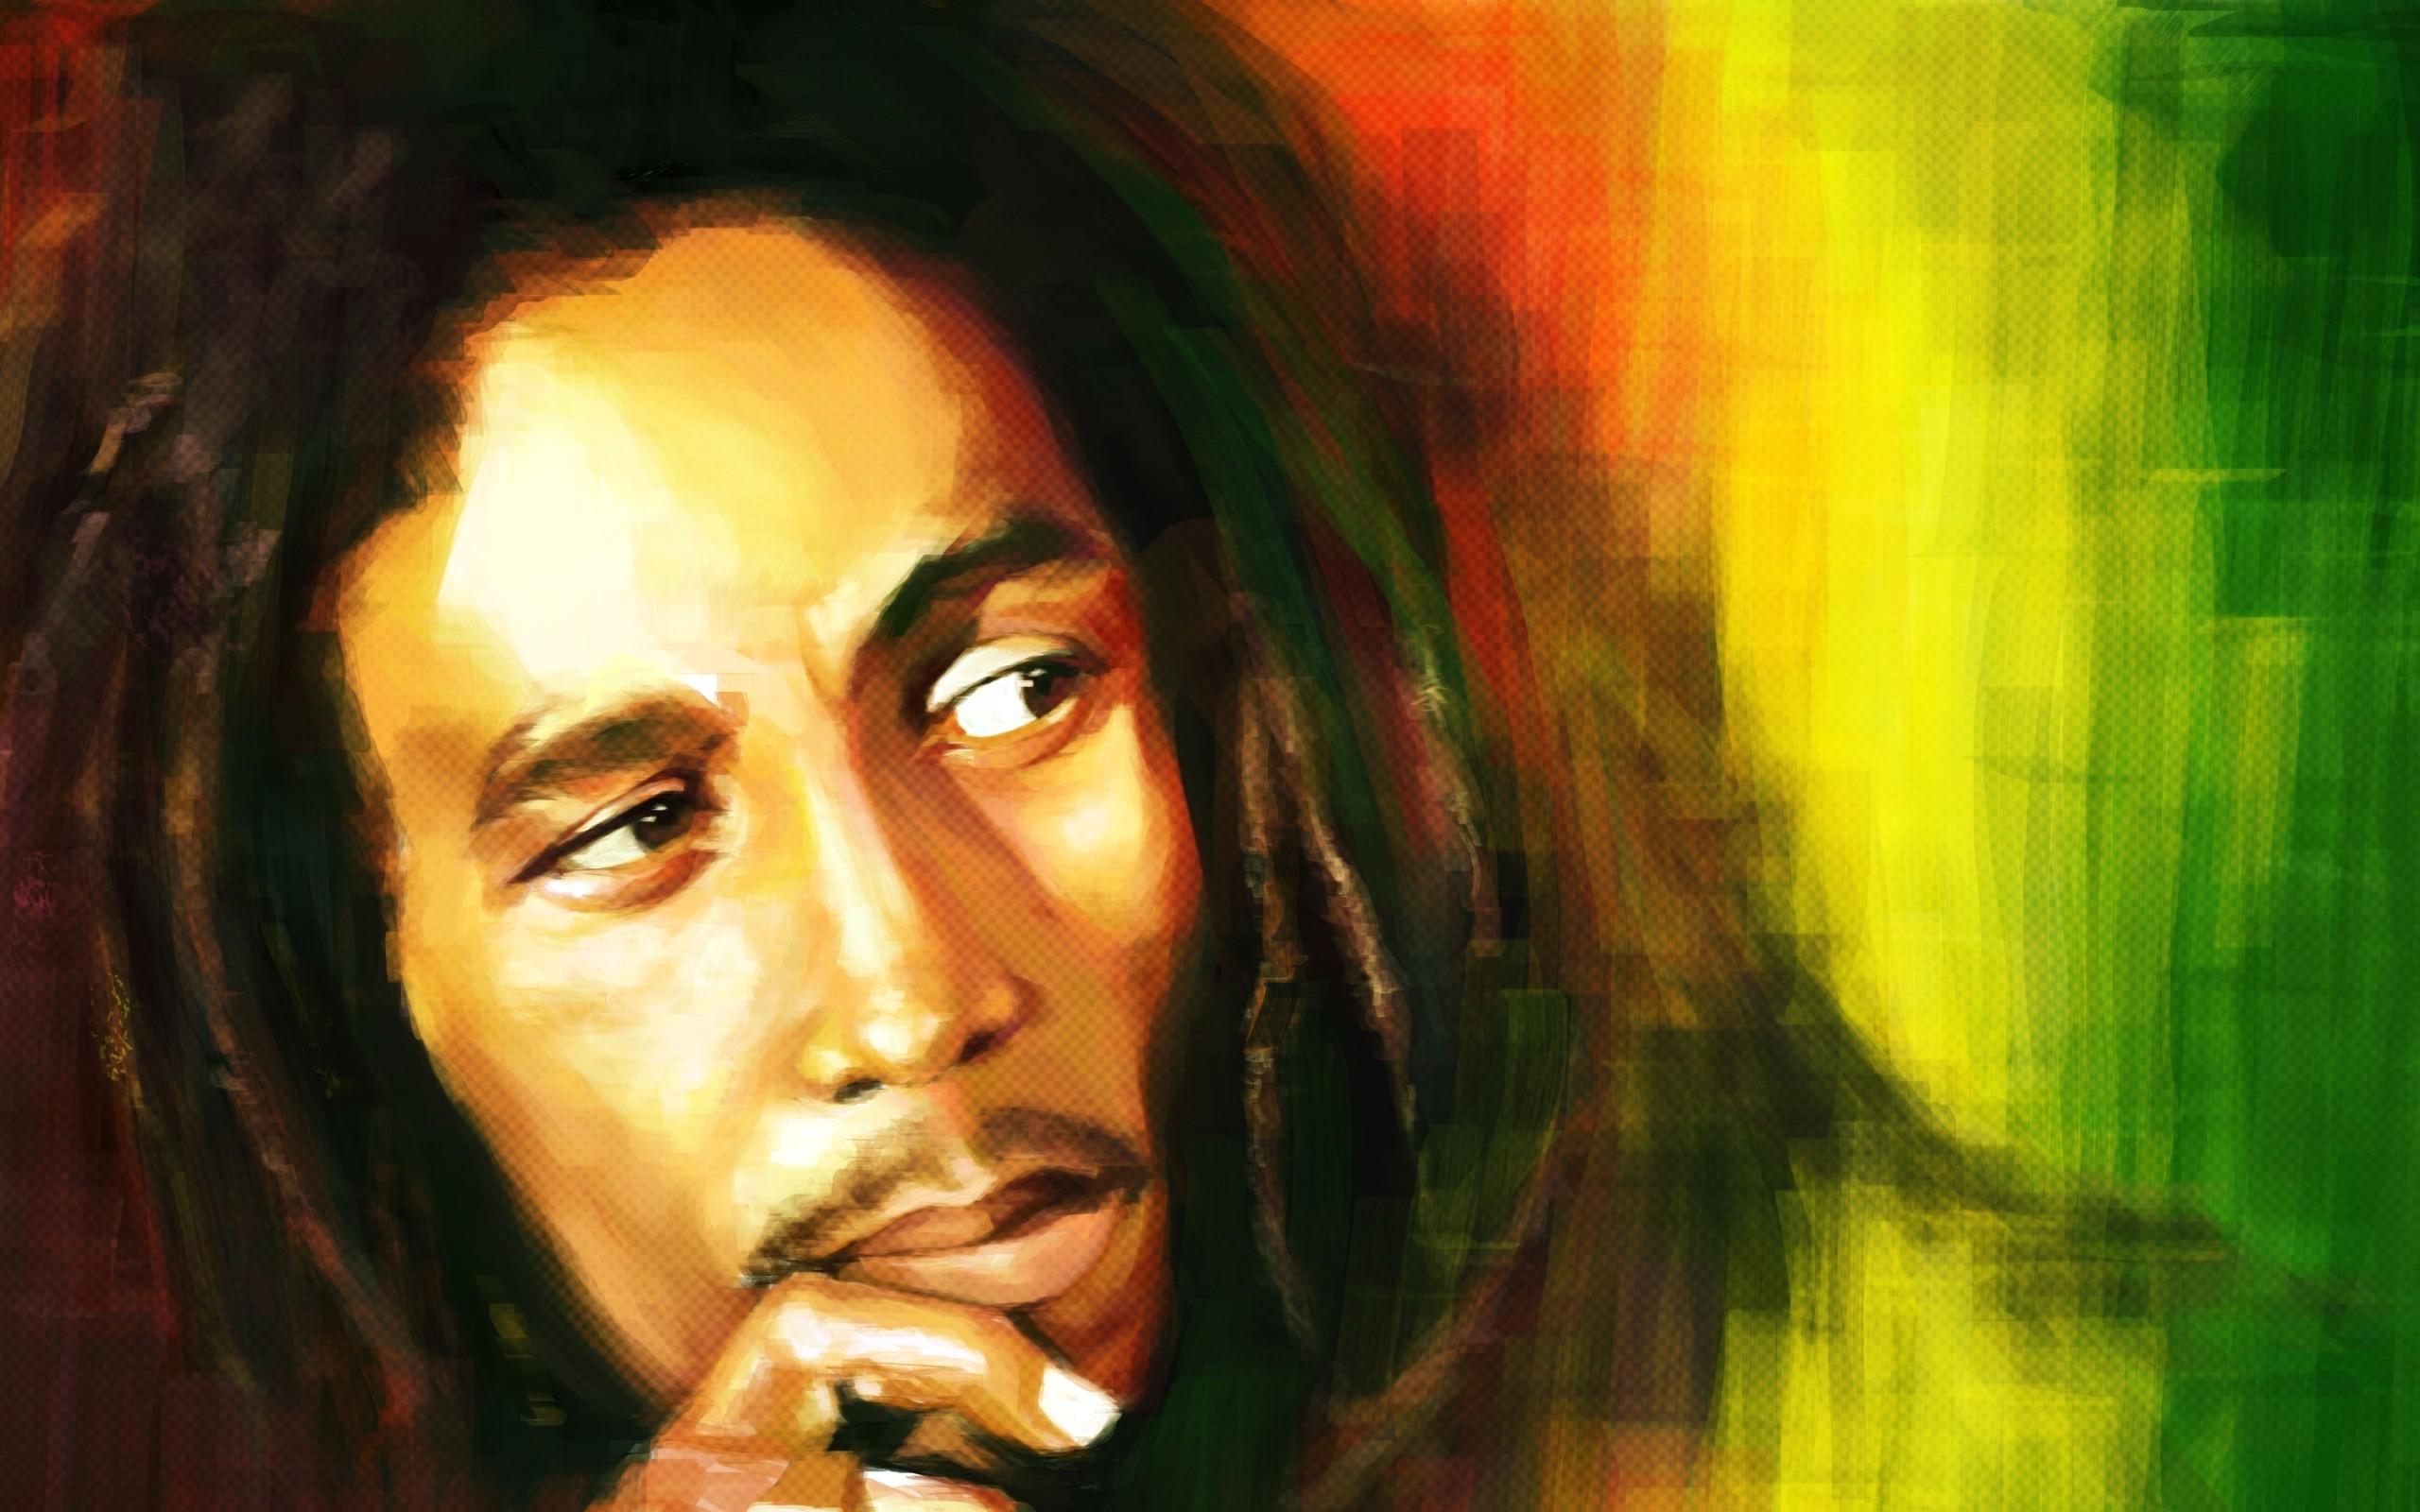 Bob Marley Widescreen Wallpaper 2560x1600